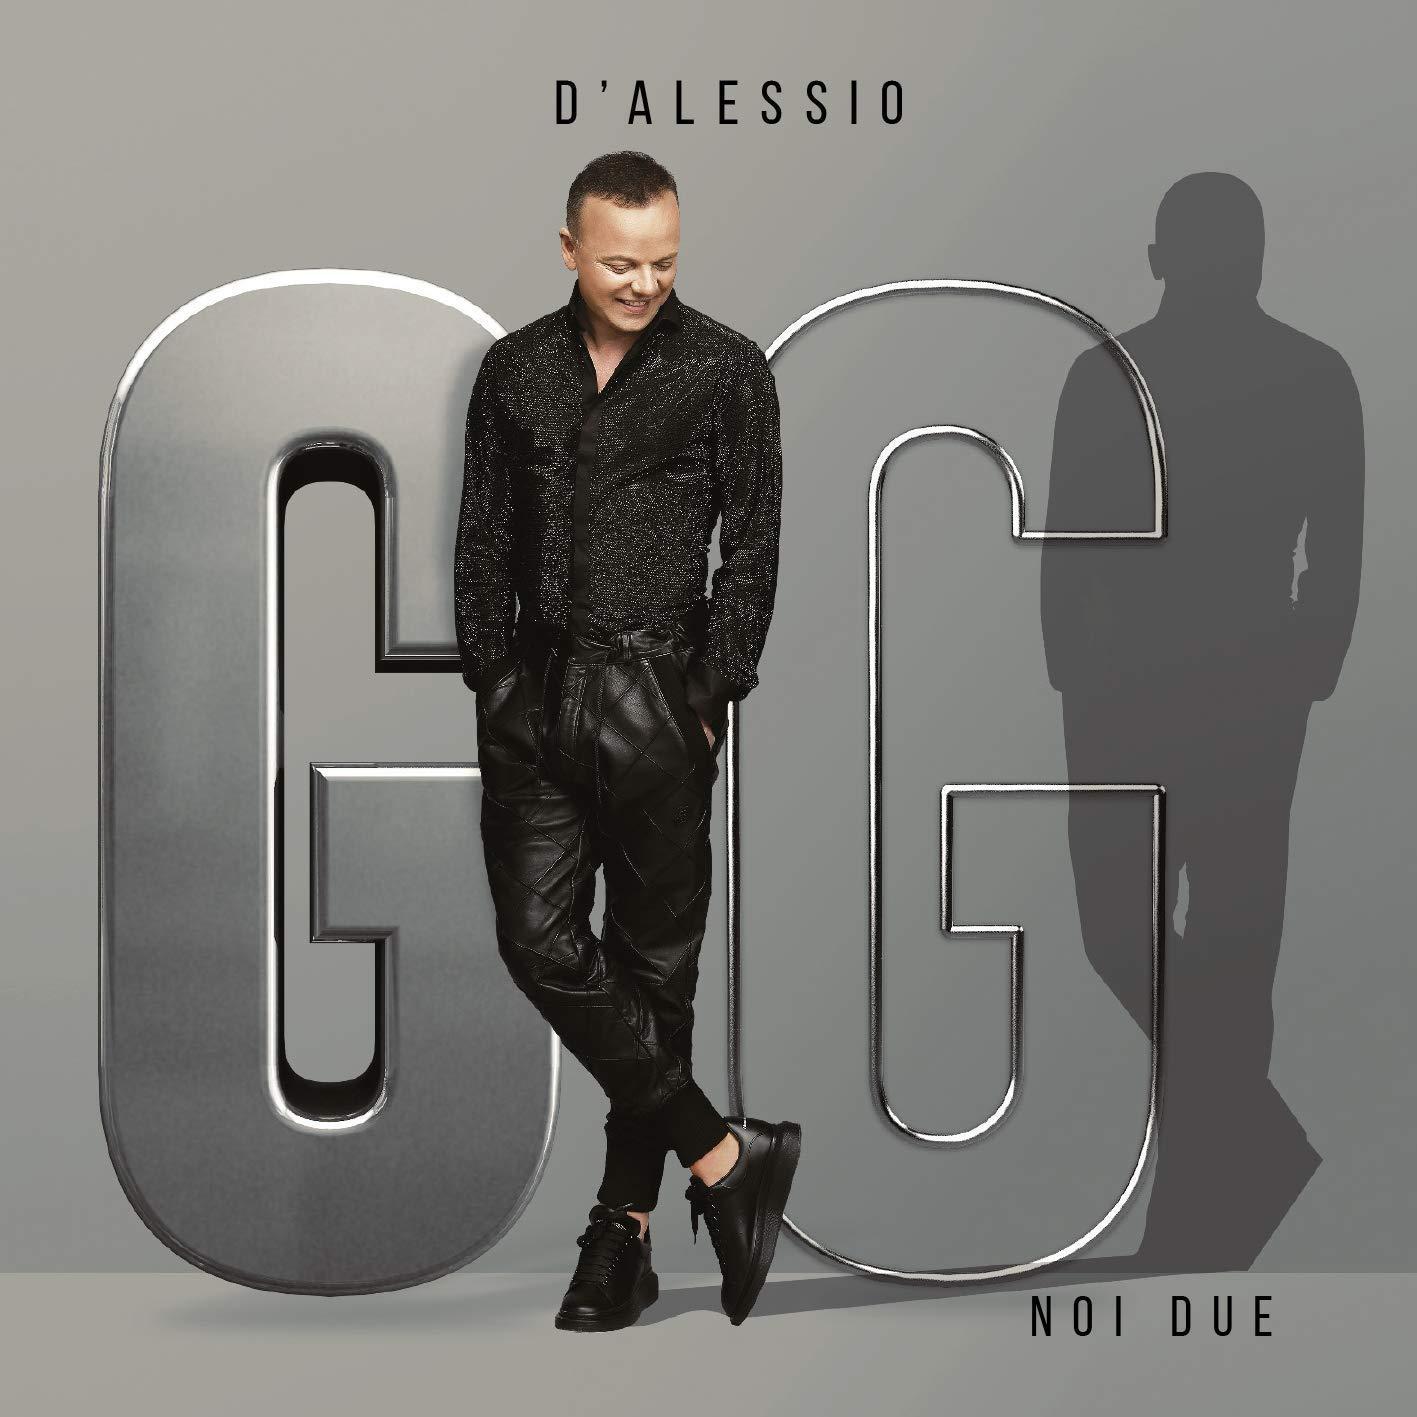 GIGI D'ALESSIO - NOI DUE (CD)